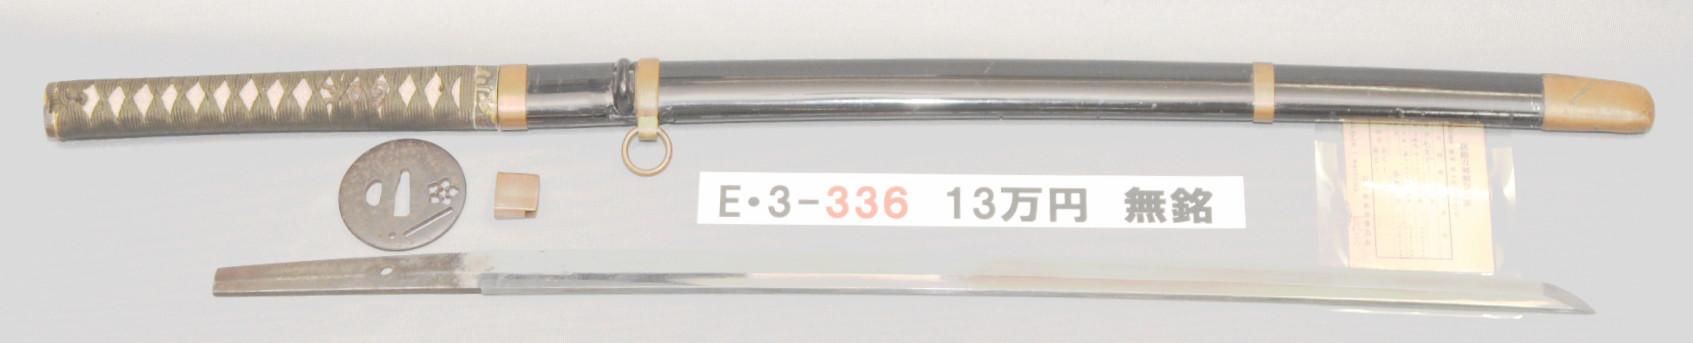 E3336